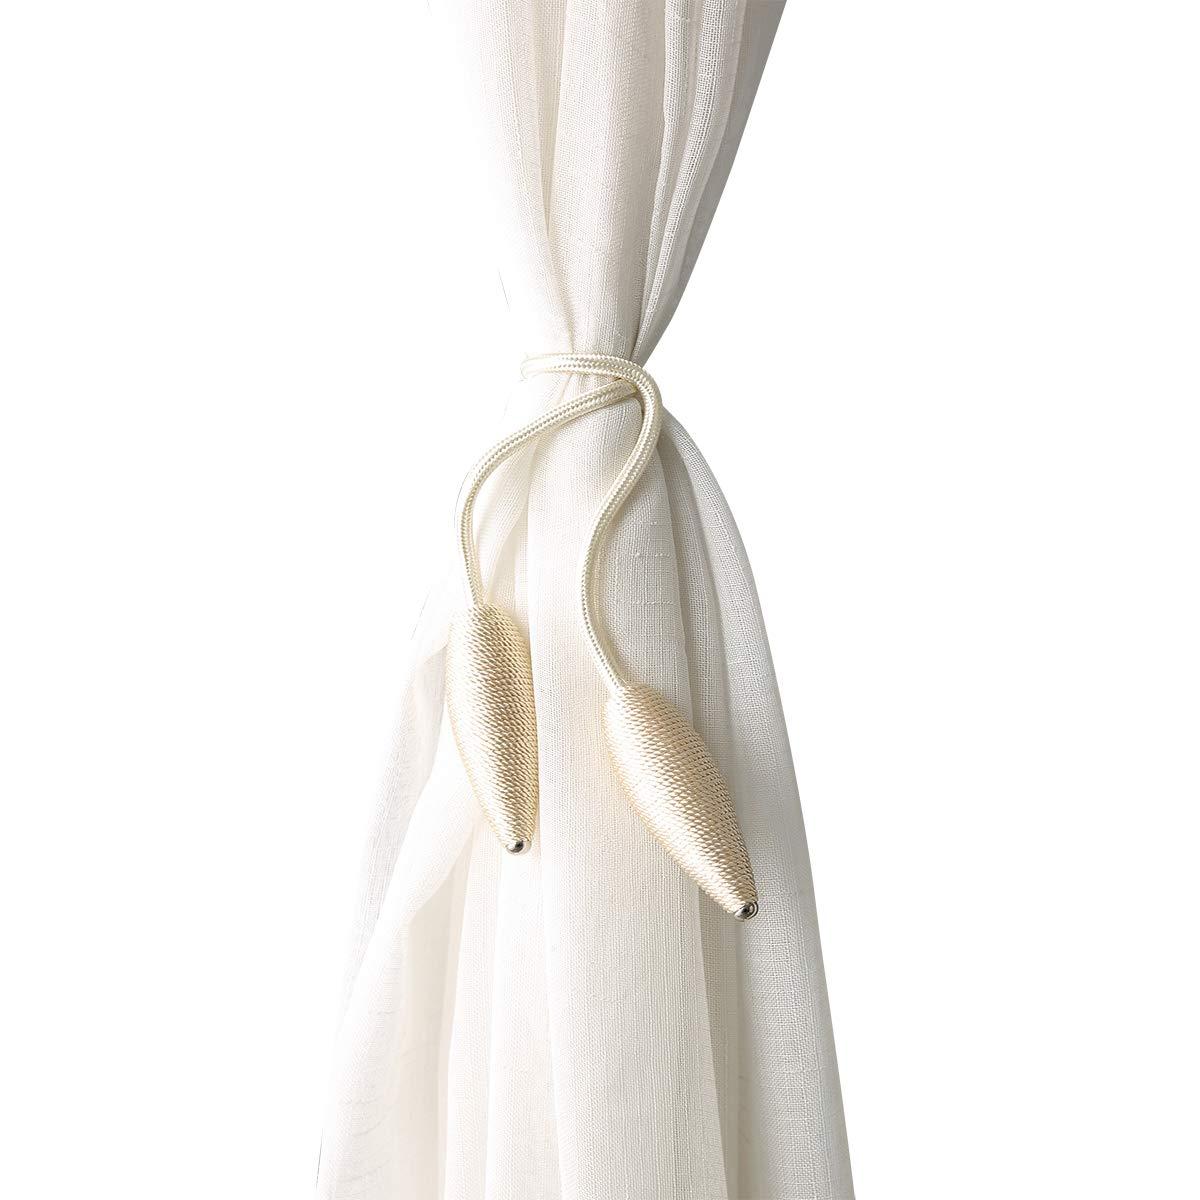 CHIMEI Curtain Tieback Fabric Window Holdback Holder Decorative Hook Draperies No Need Drilling